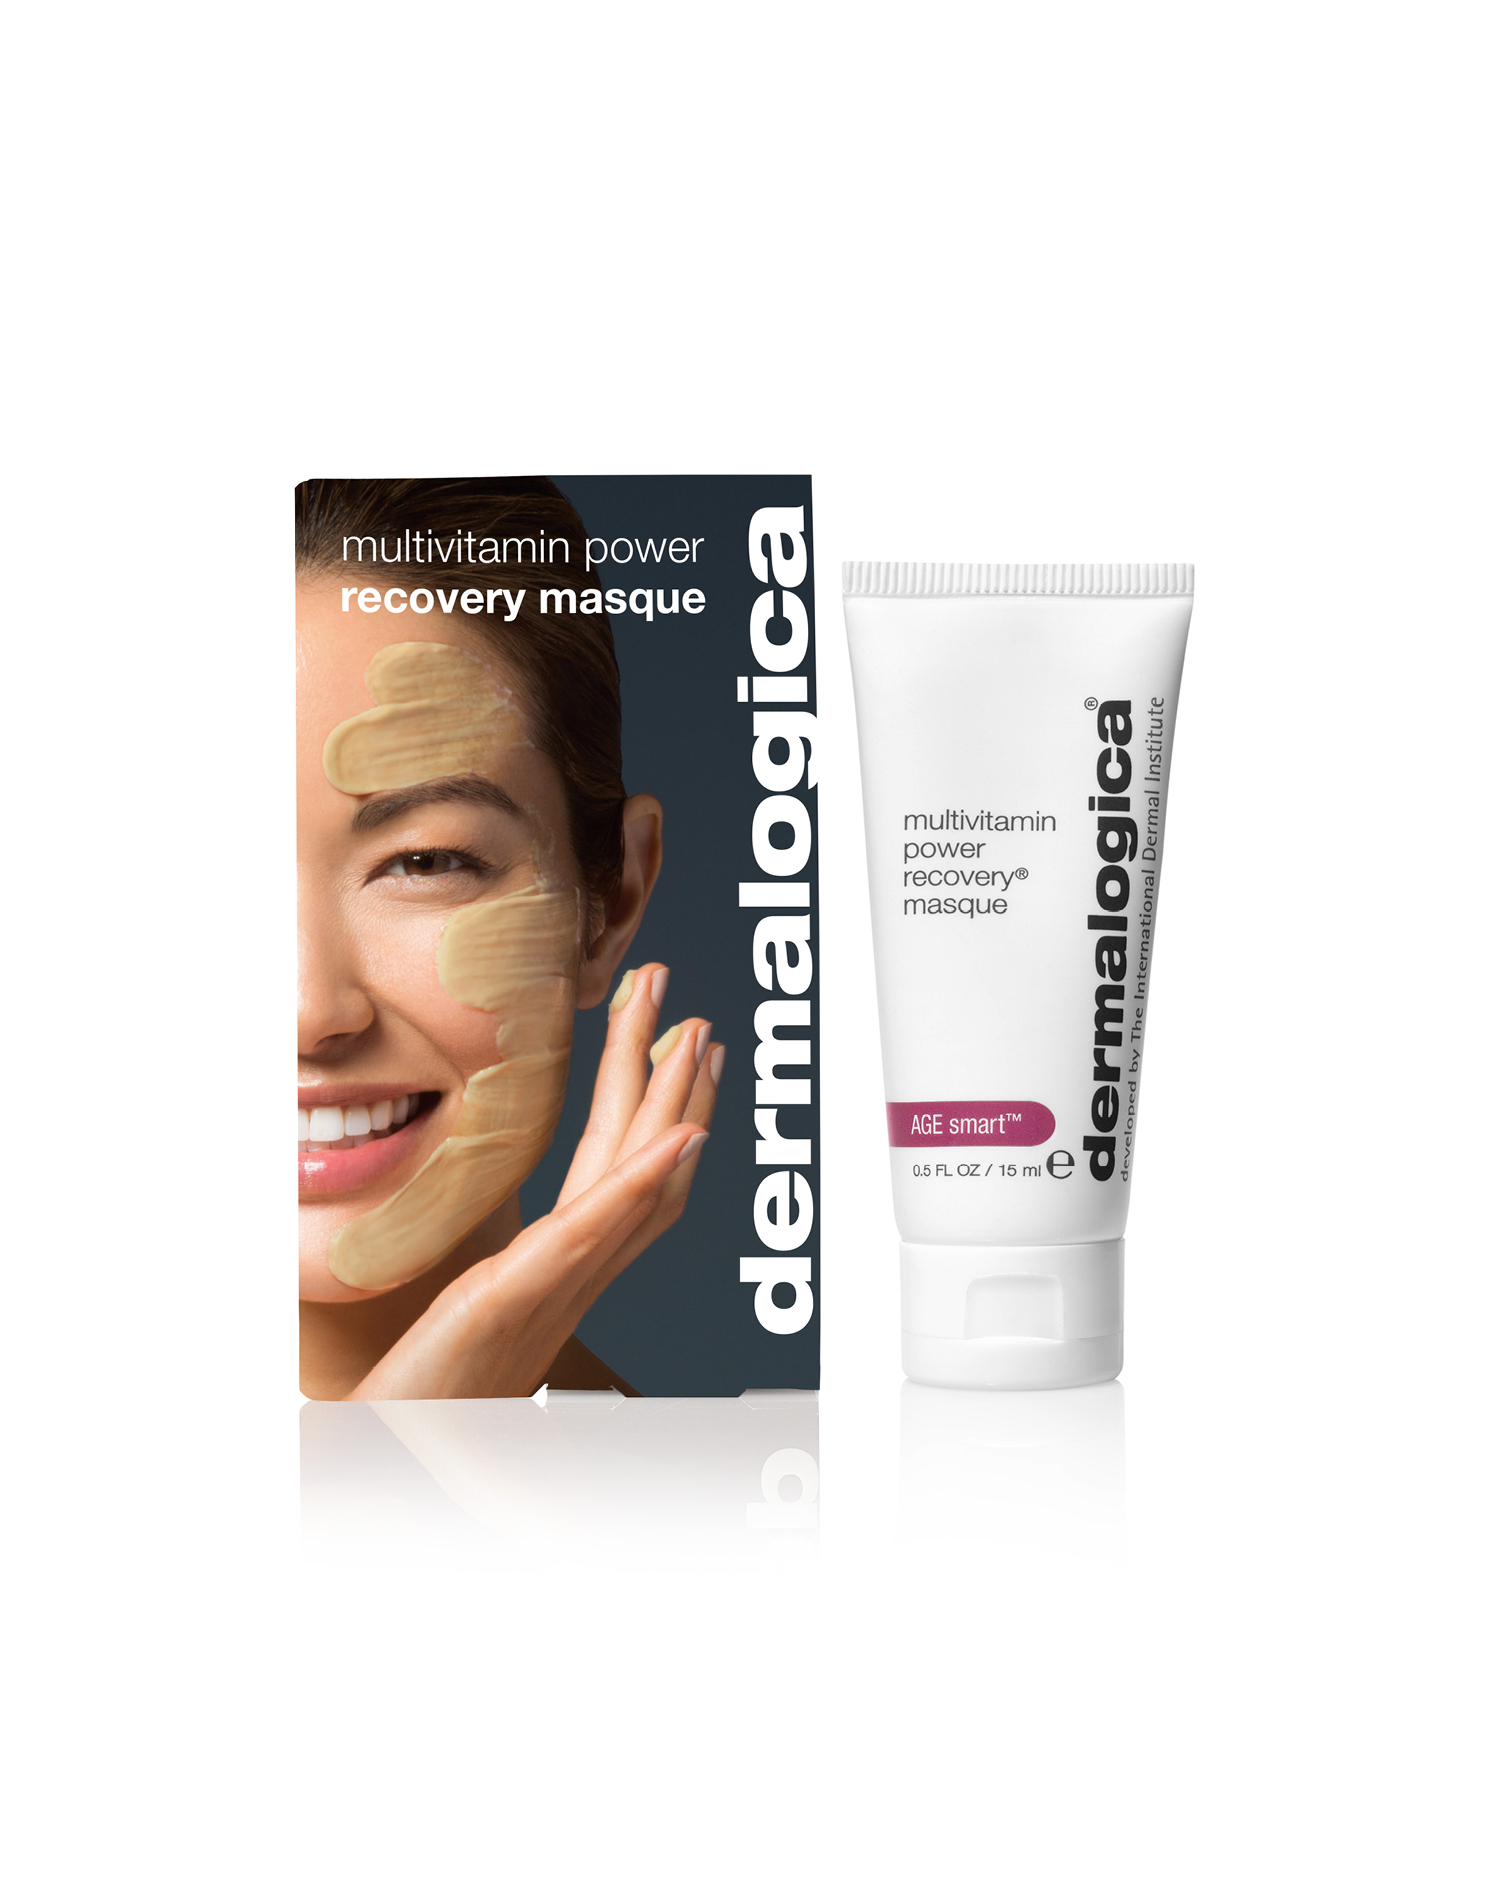 Dermalogica Multivitamin Power Recovery Masque, 15 ml